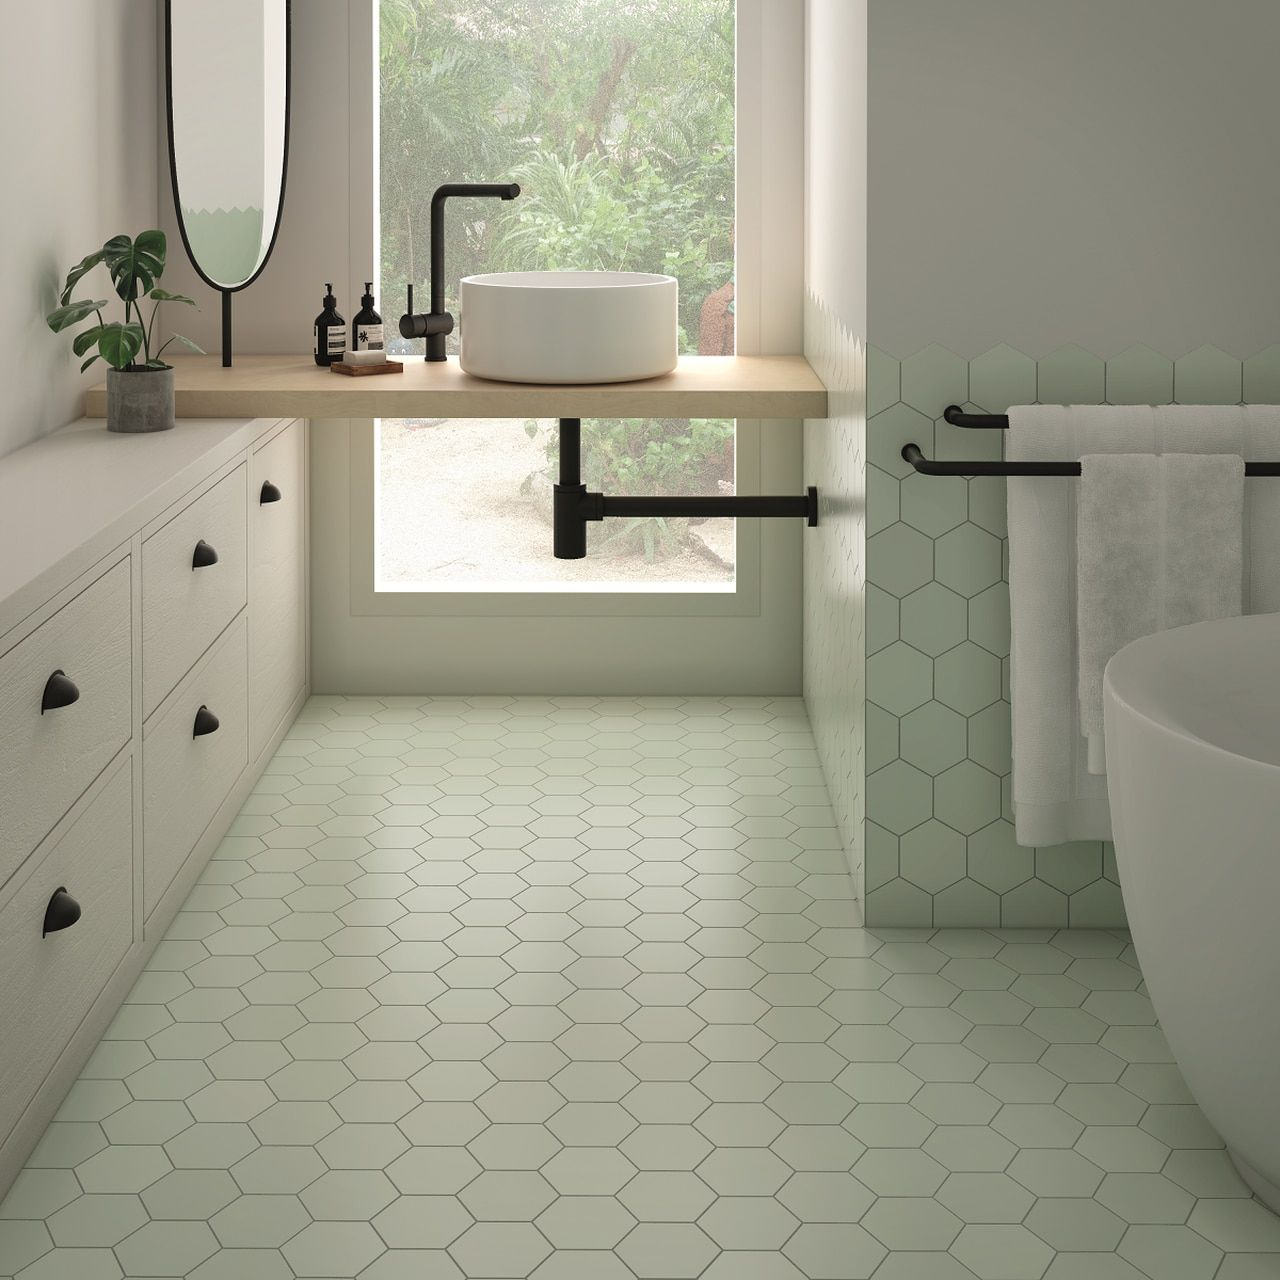 Kromatika 5 X 4 Mint Matte Finish Hexagon Porcelain Floor Wall Tile 5 97 Per Square Foot In 2020 Hexagon Tile Kitchen Floor Hexagon Tile Bathroom Floor White Hexagon Tile Bathroom